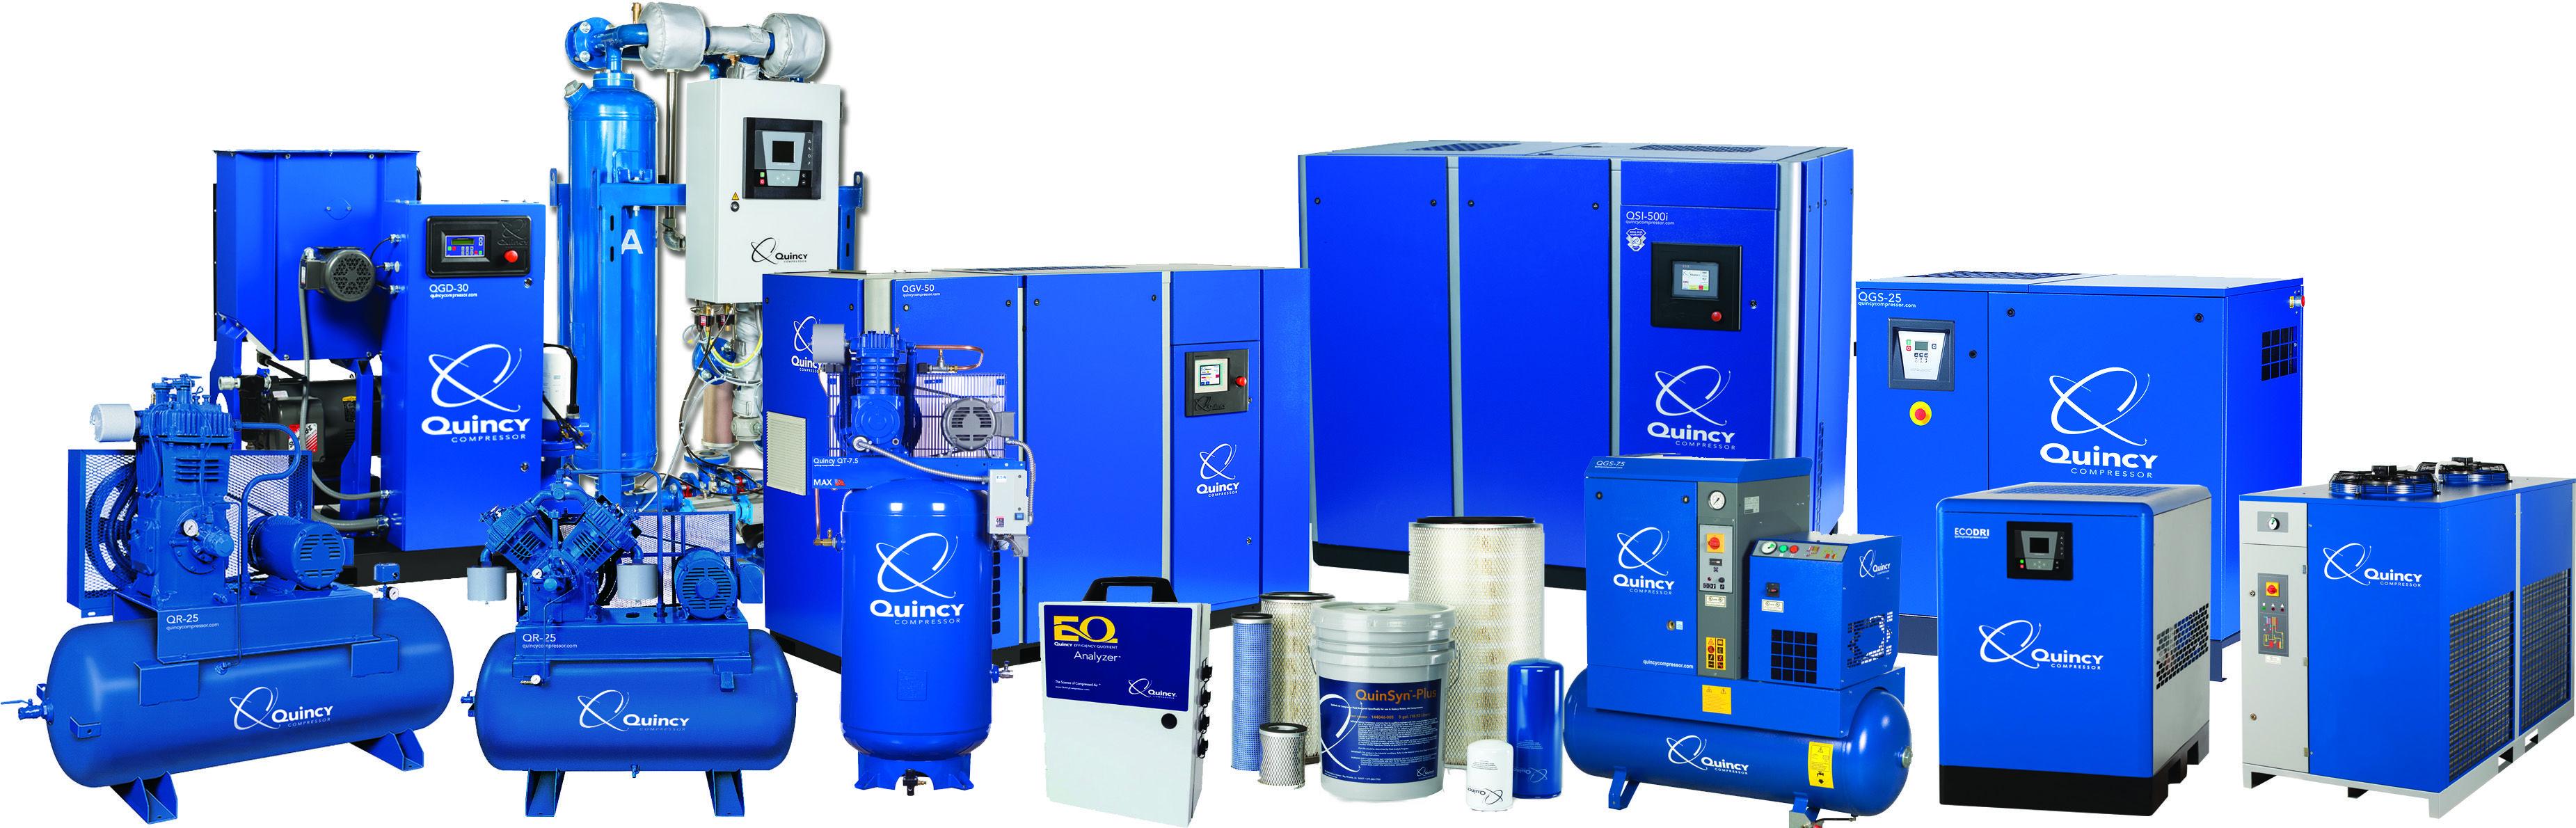 Quincy Compressor Product Portfolio Locker storage